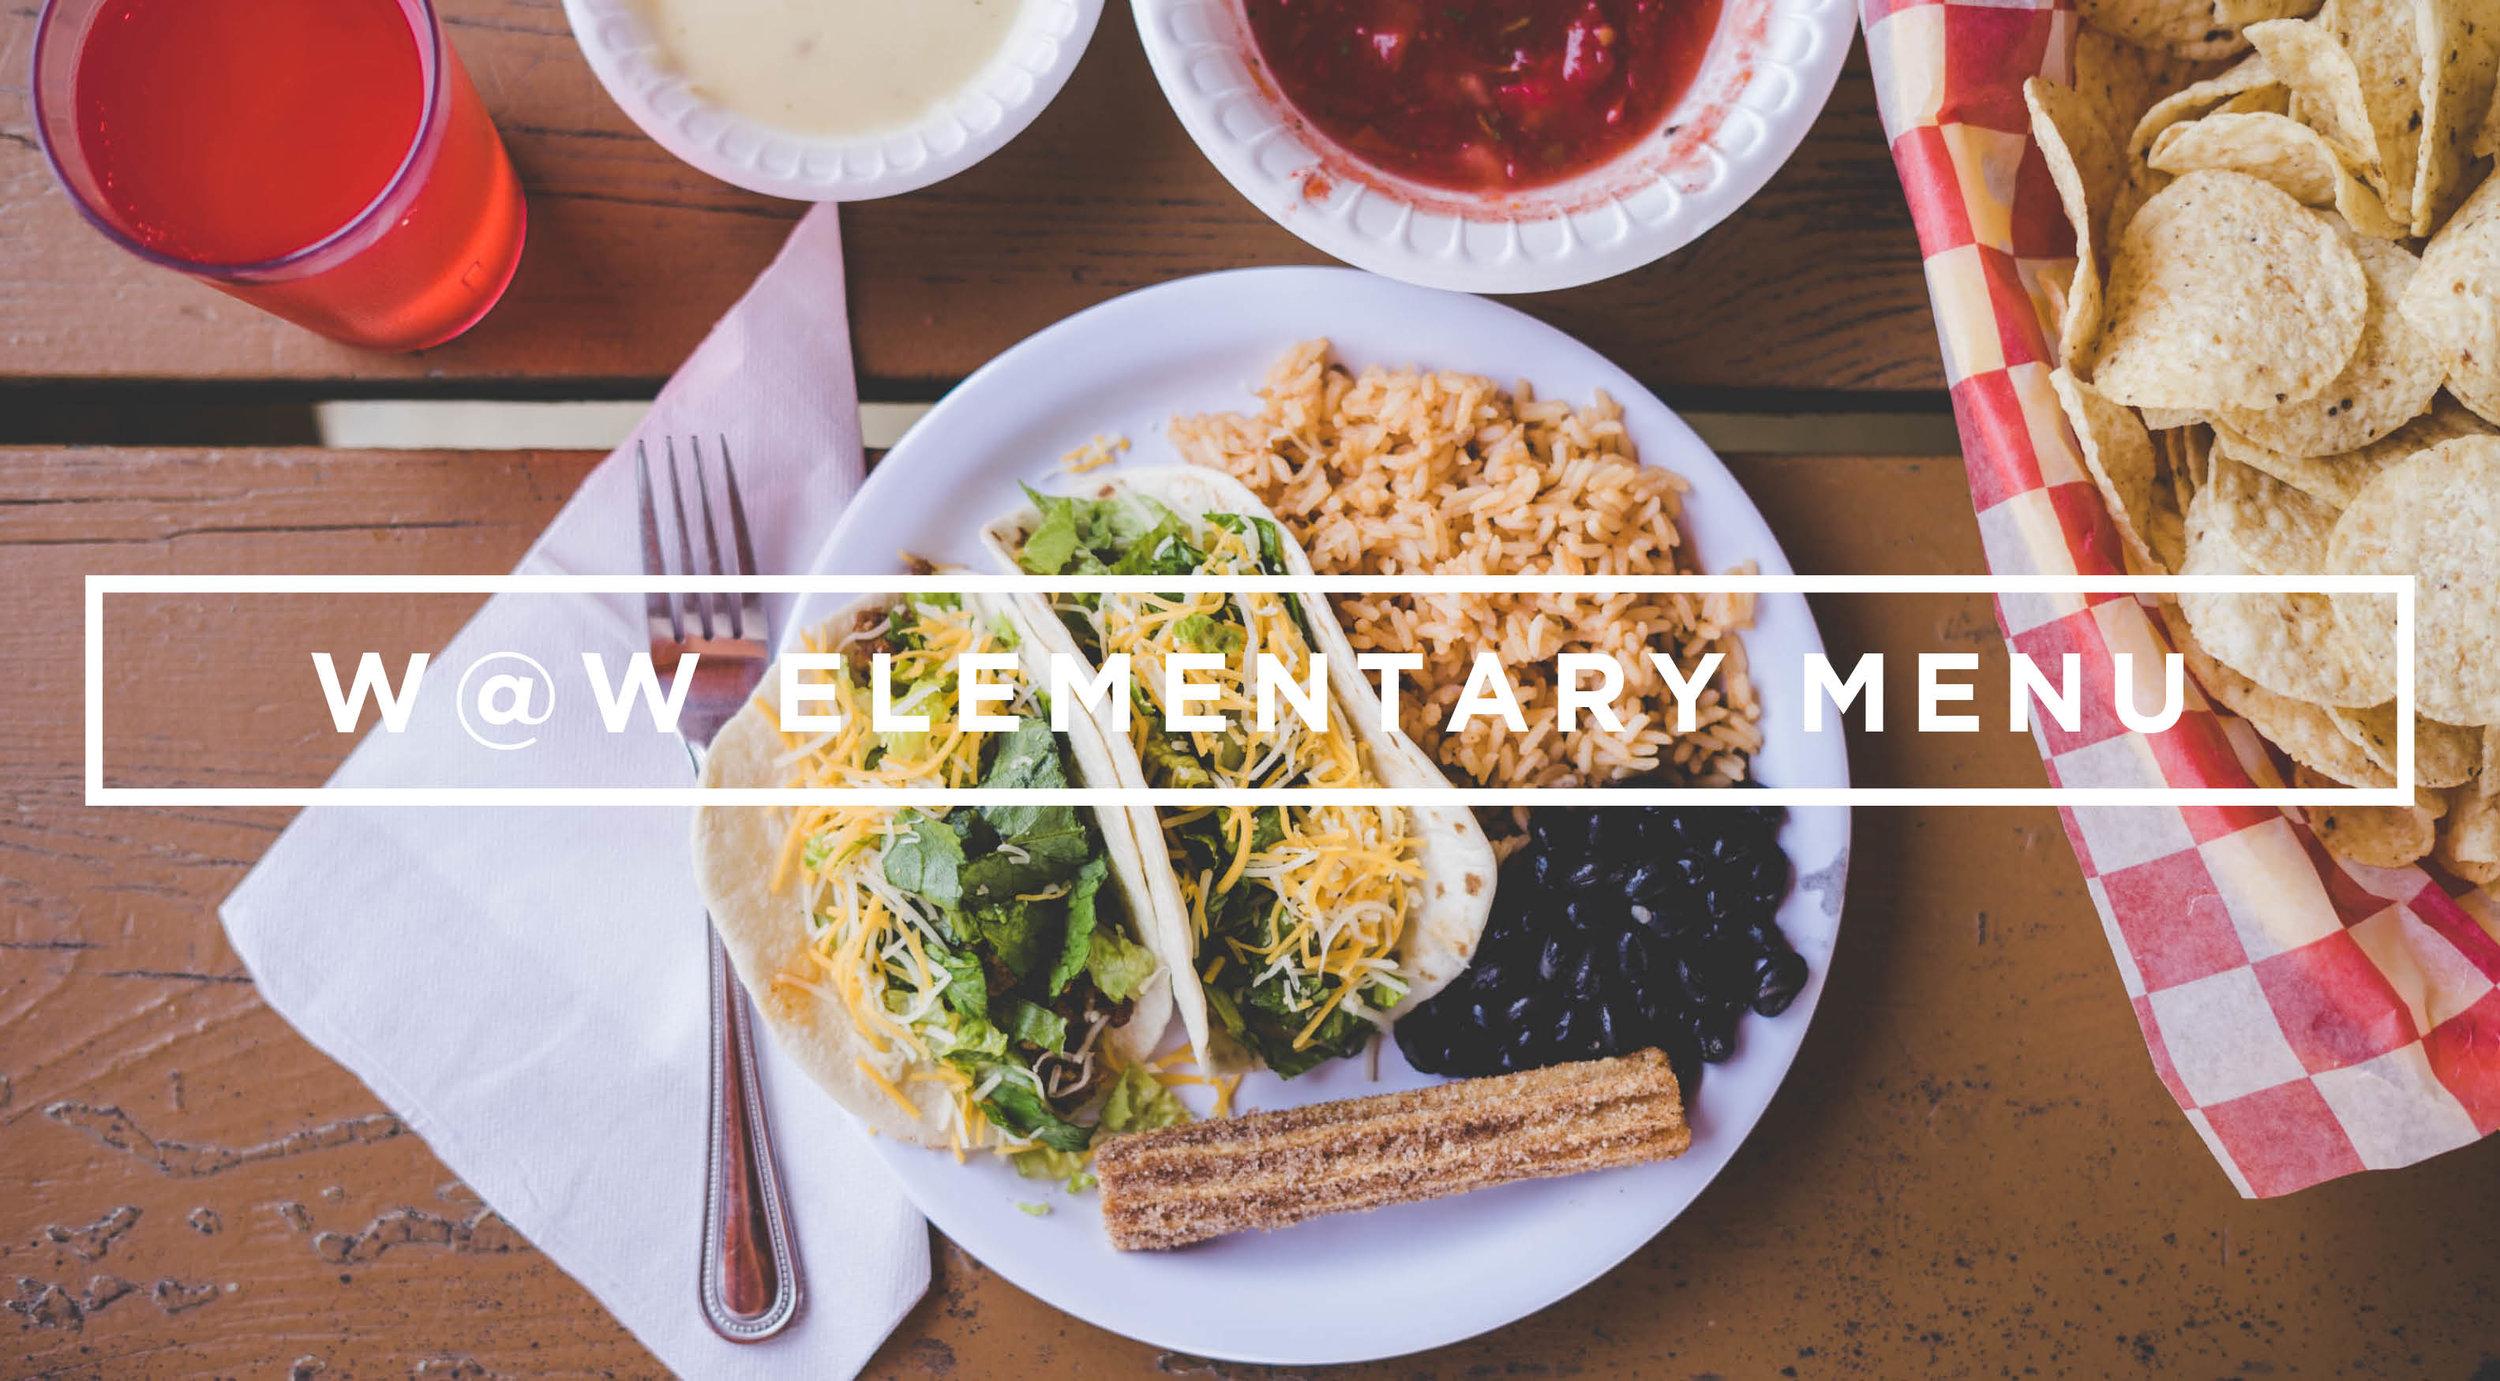 Elementary menu.jpg